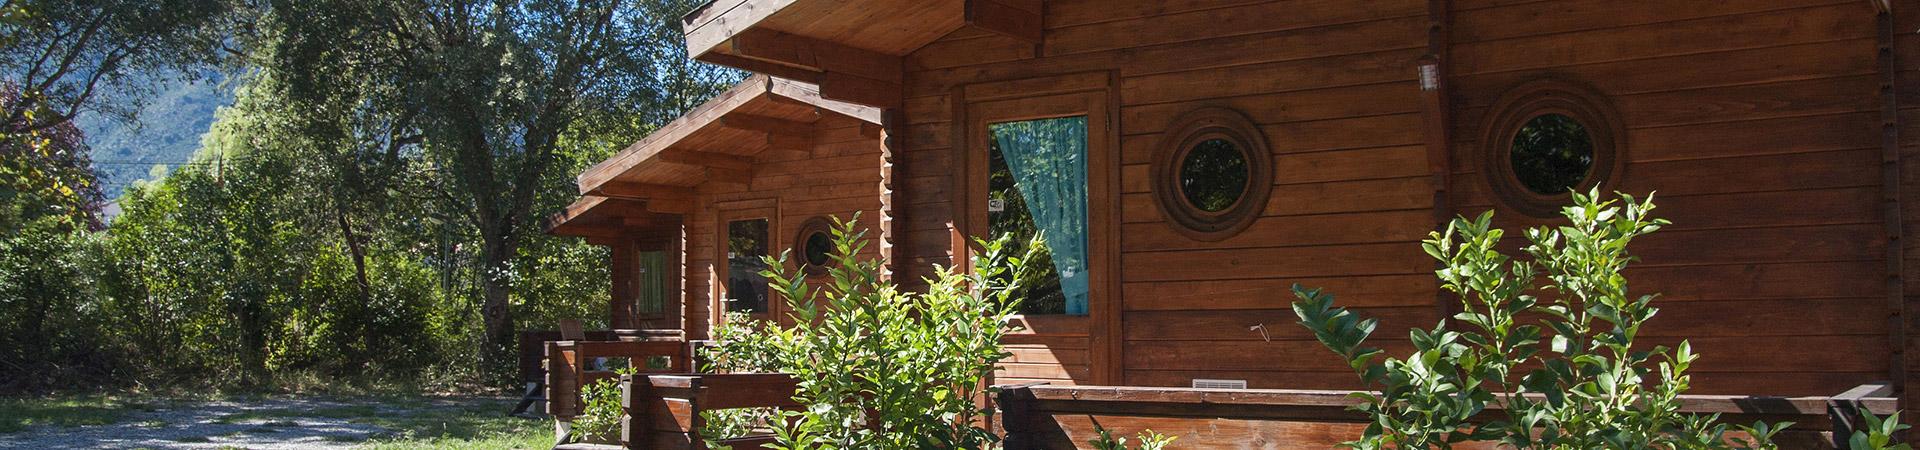 location-muntagna-camping-merendella